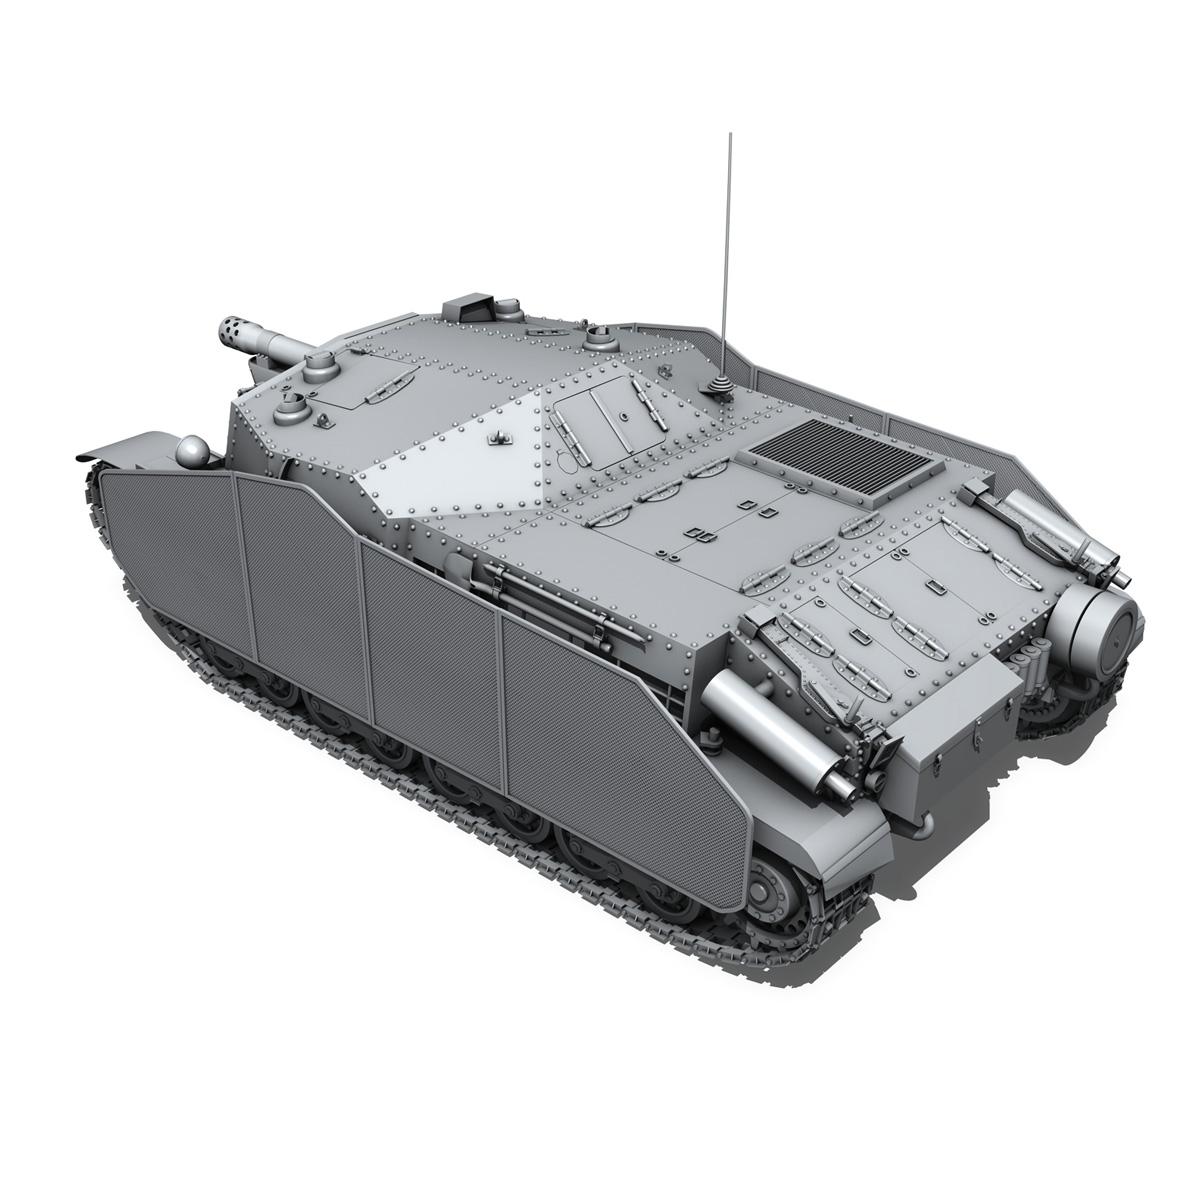 43m zrinyi ii - Macar hücum silahı 3d model 3ds fbx c4d lwo obj 251632